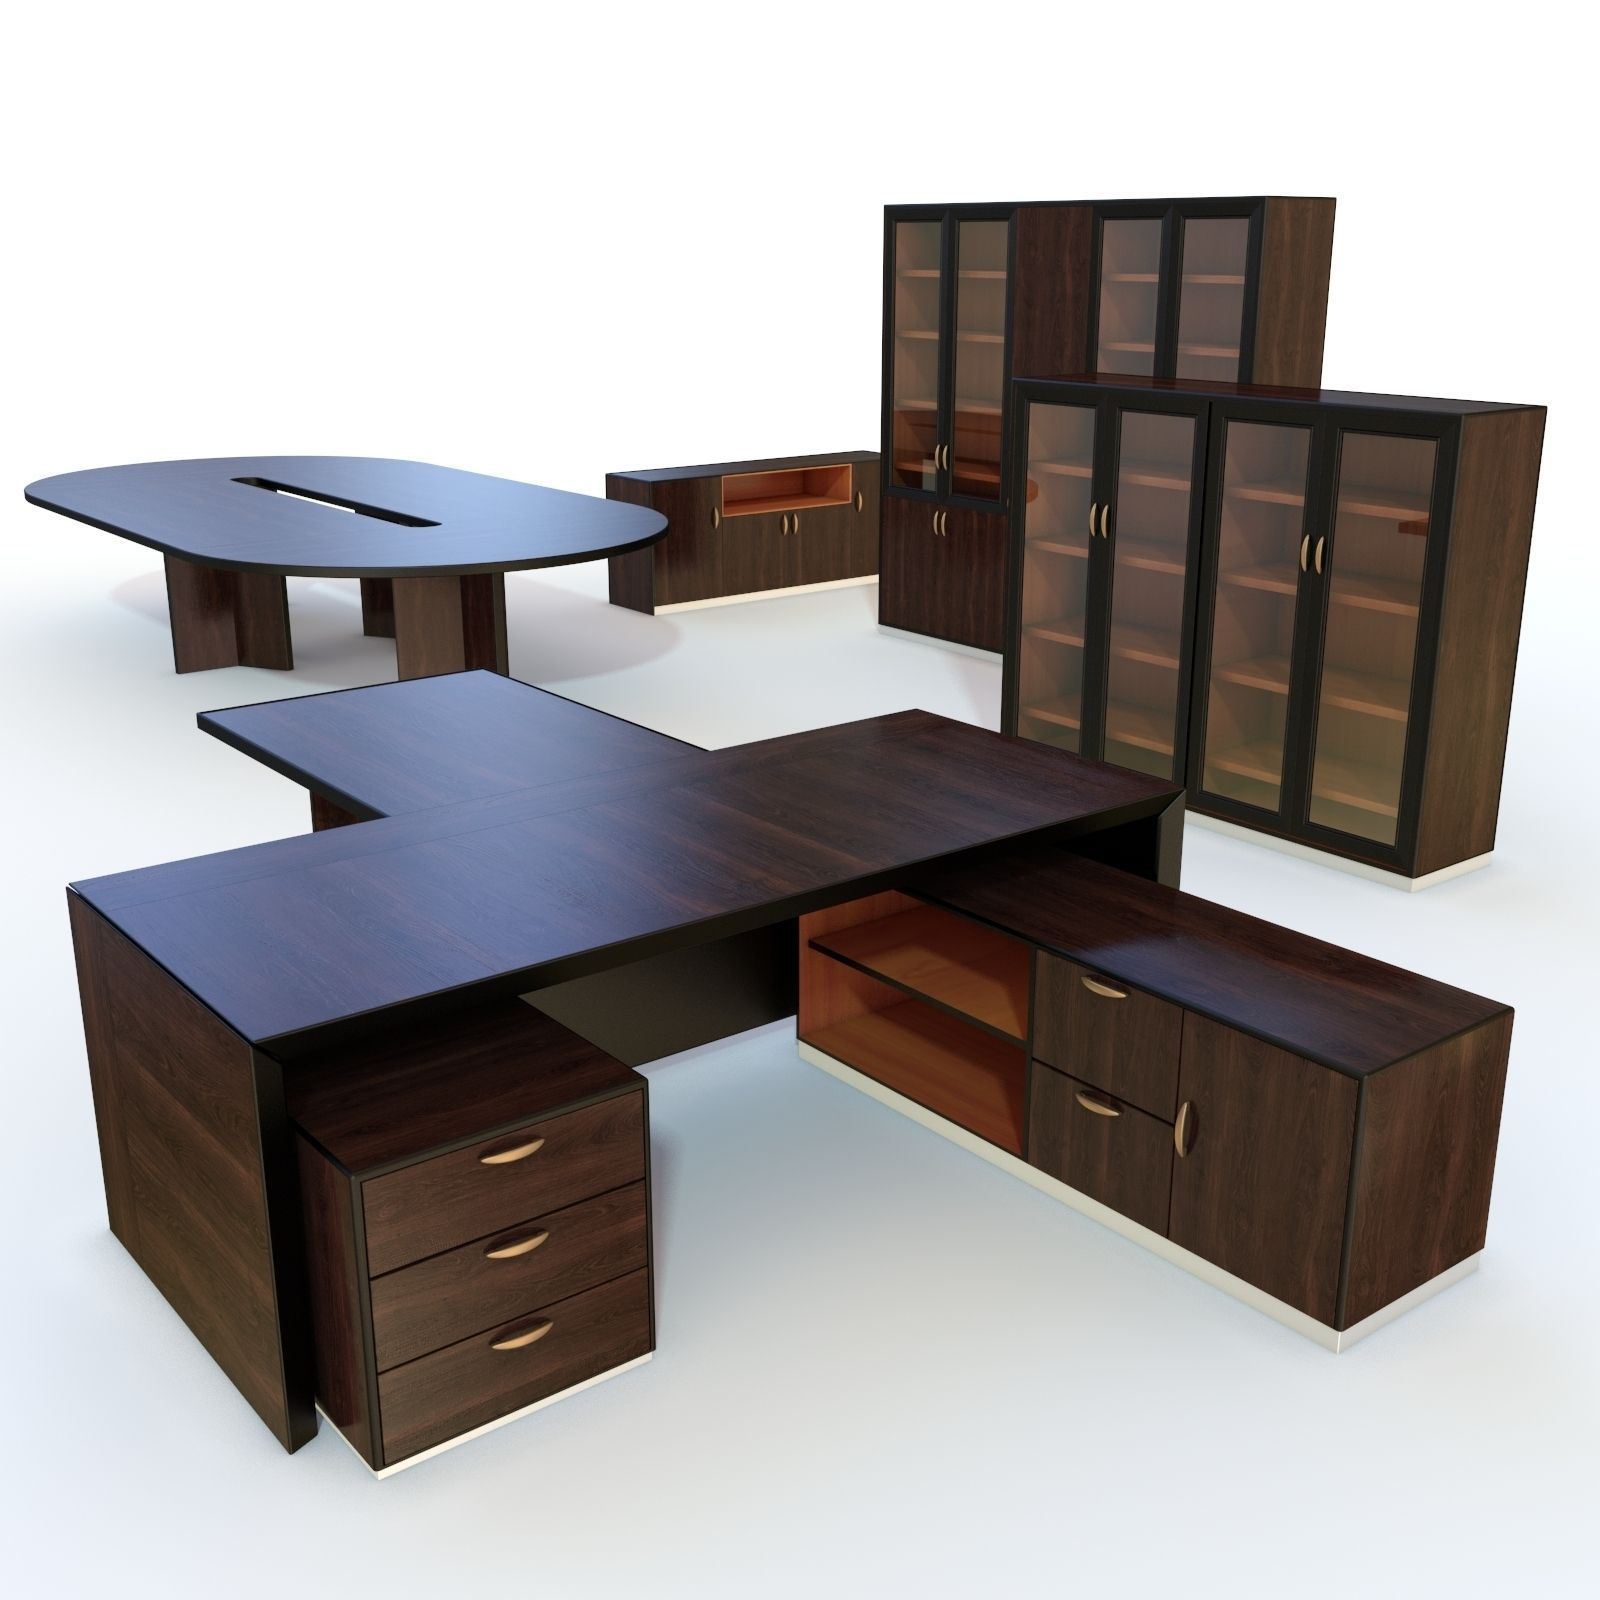 3d Model Office Furniture 3 Vr Ar Low Poly Max Obj 3ds